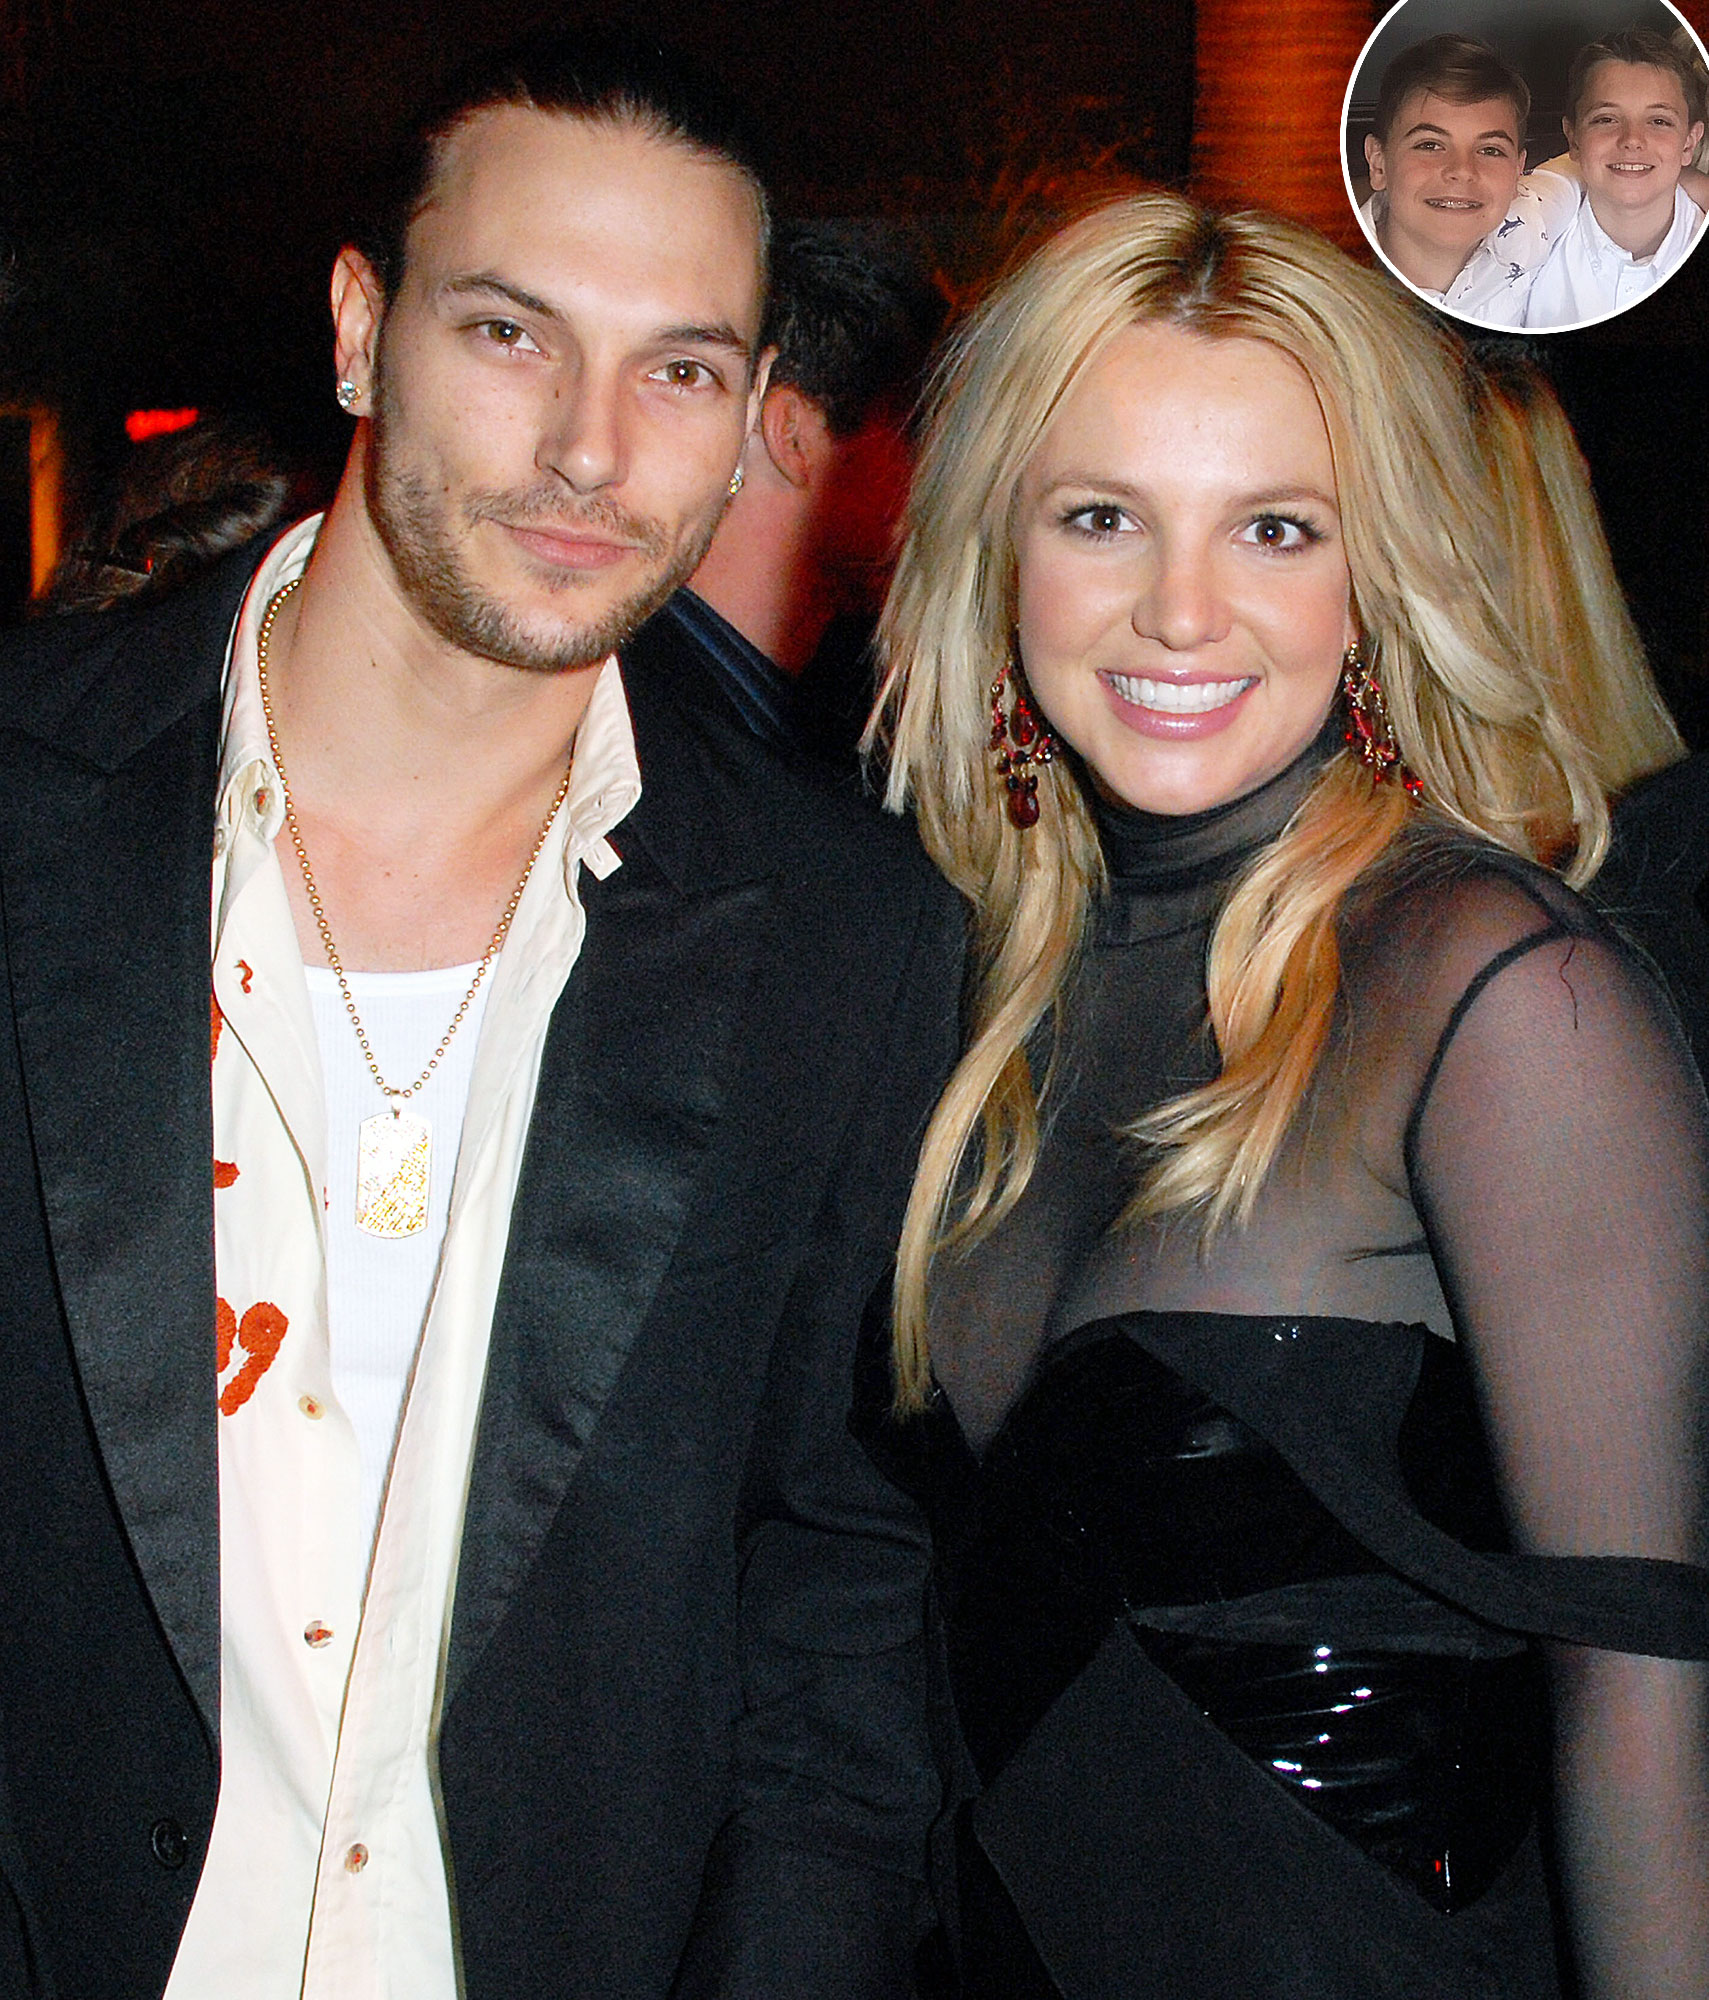 Britney Spears Mental Health Facility Sons With Kevin Federline - Kevin Federline, Britney Spears, Sean Preston and Jayden James.